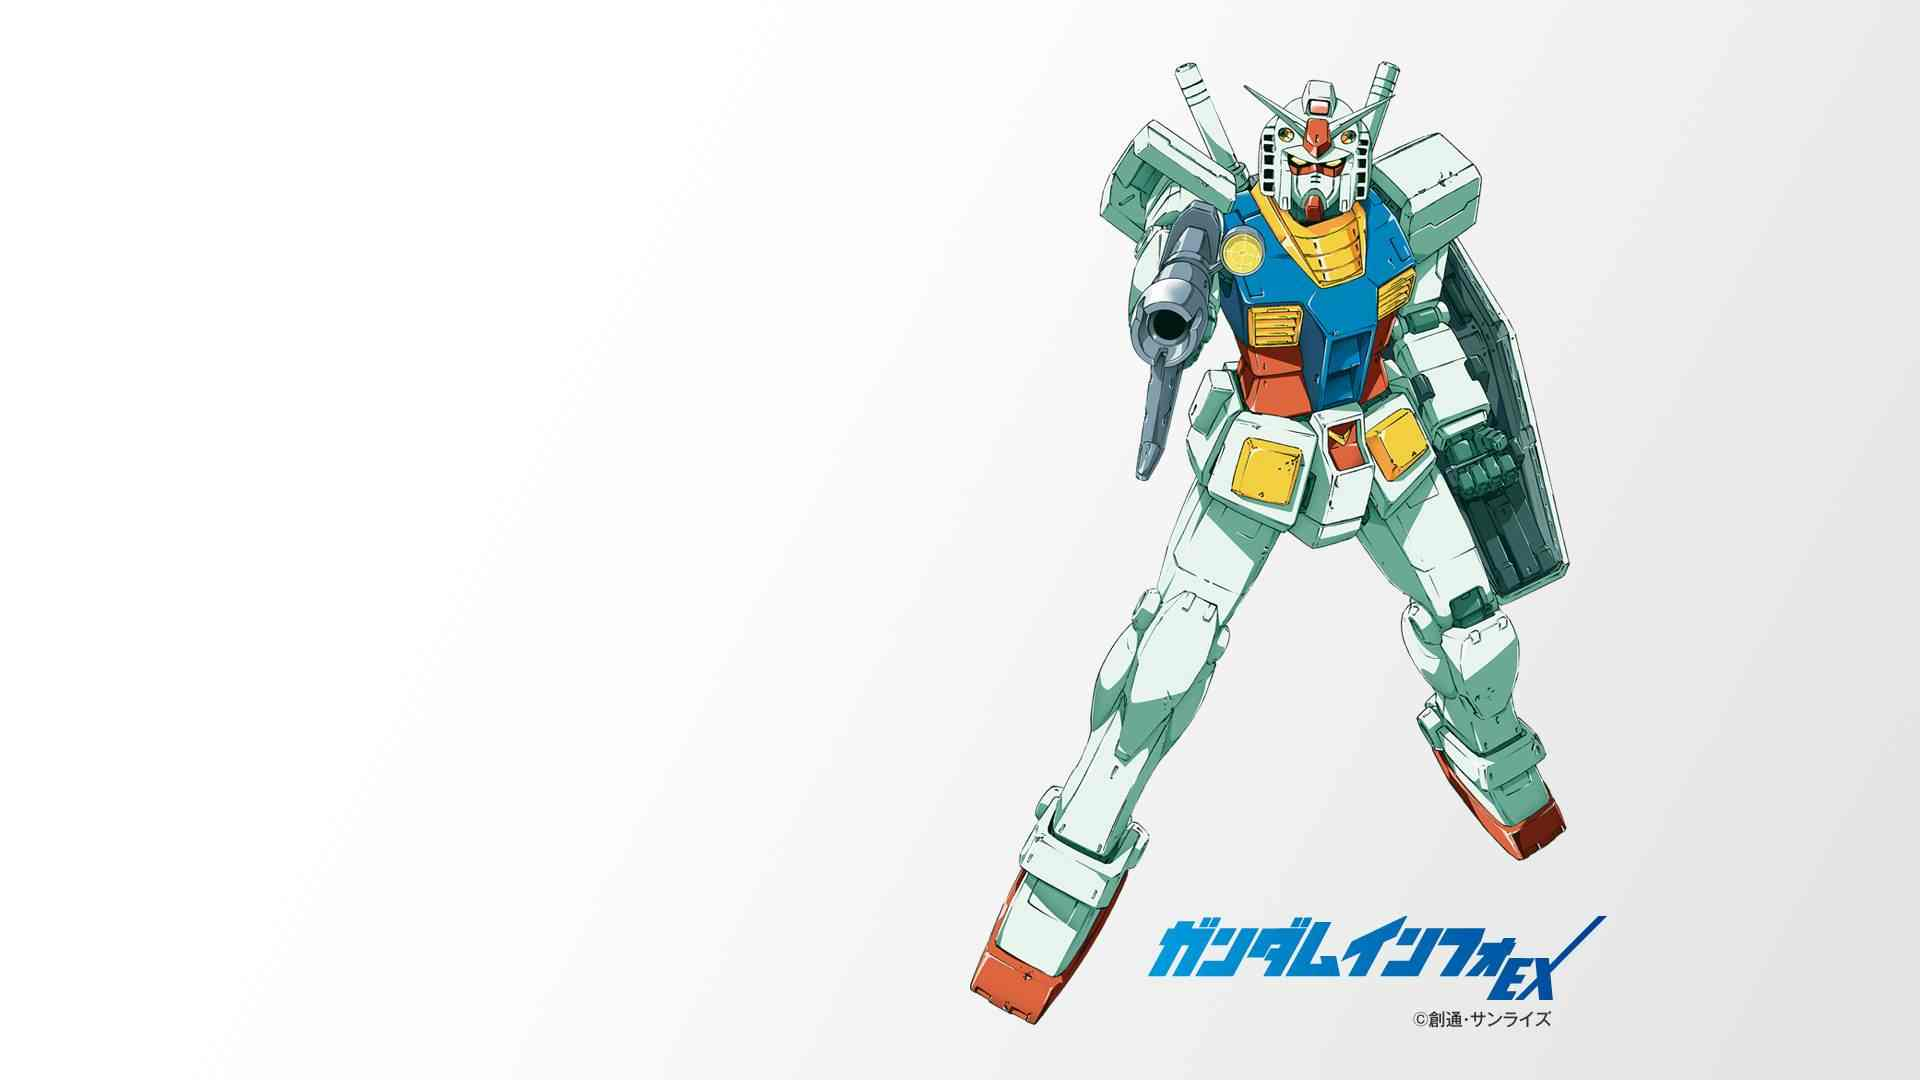 Gundam Vita game receives trailer